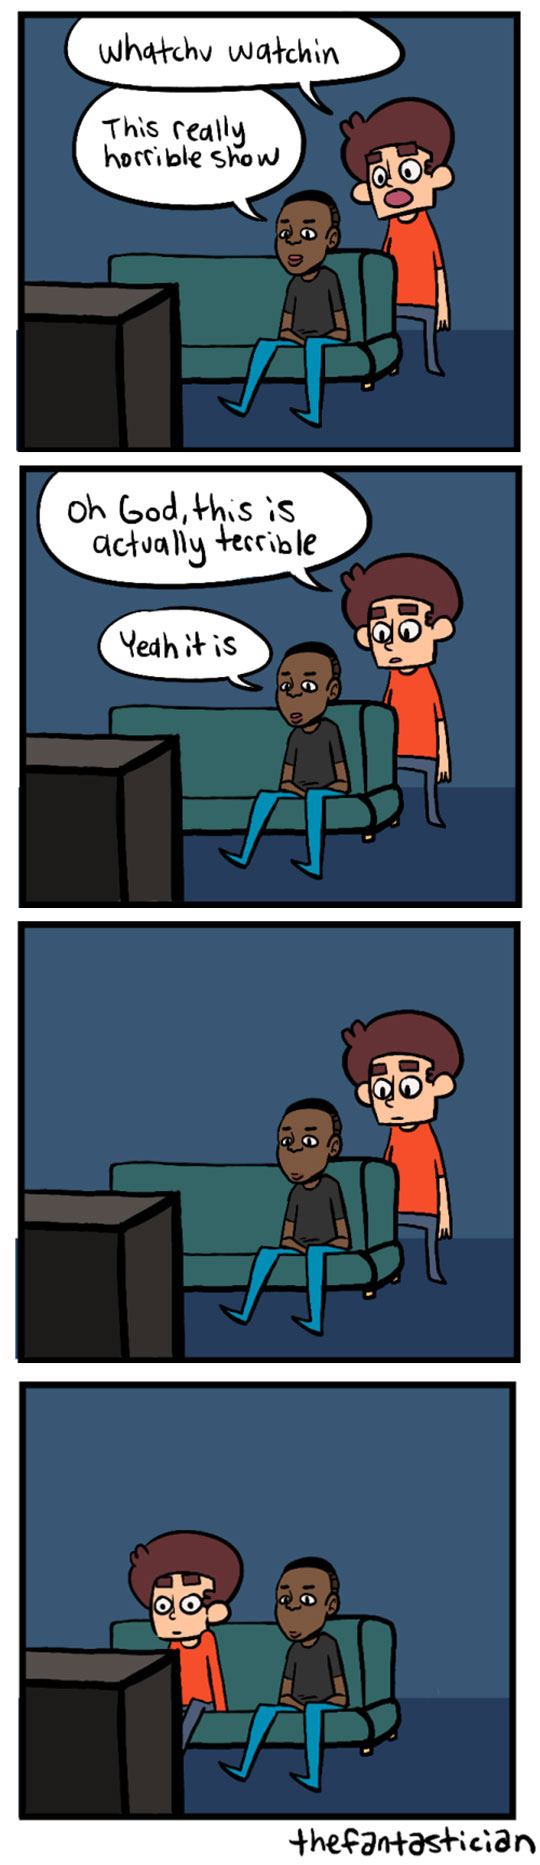 funny-webcomic-watching-TV-reality